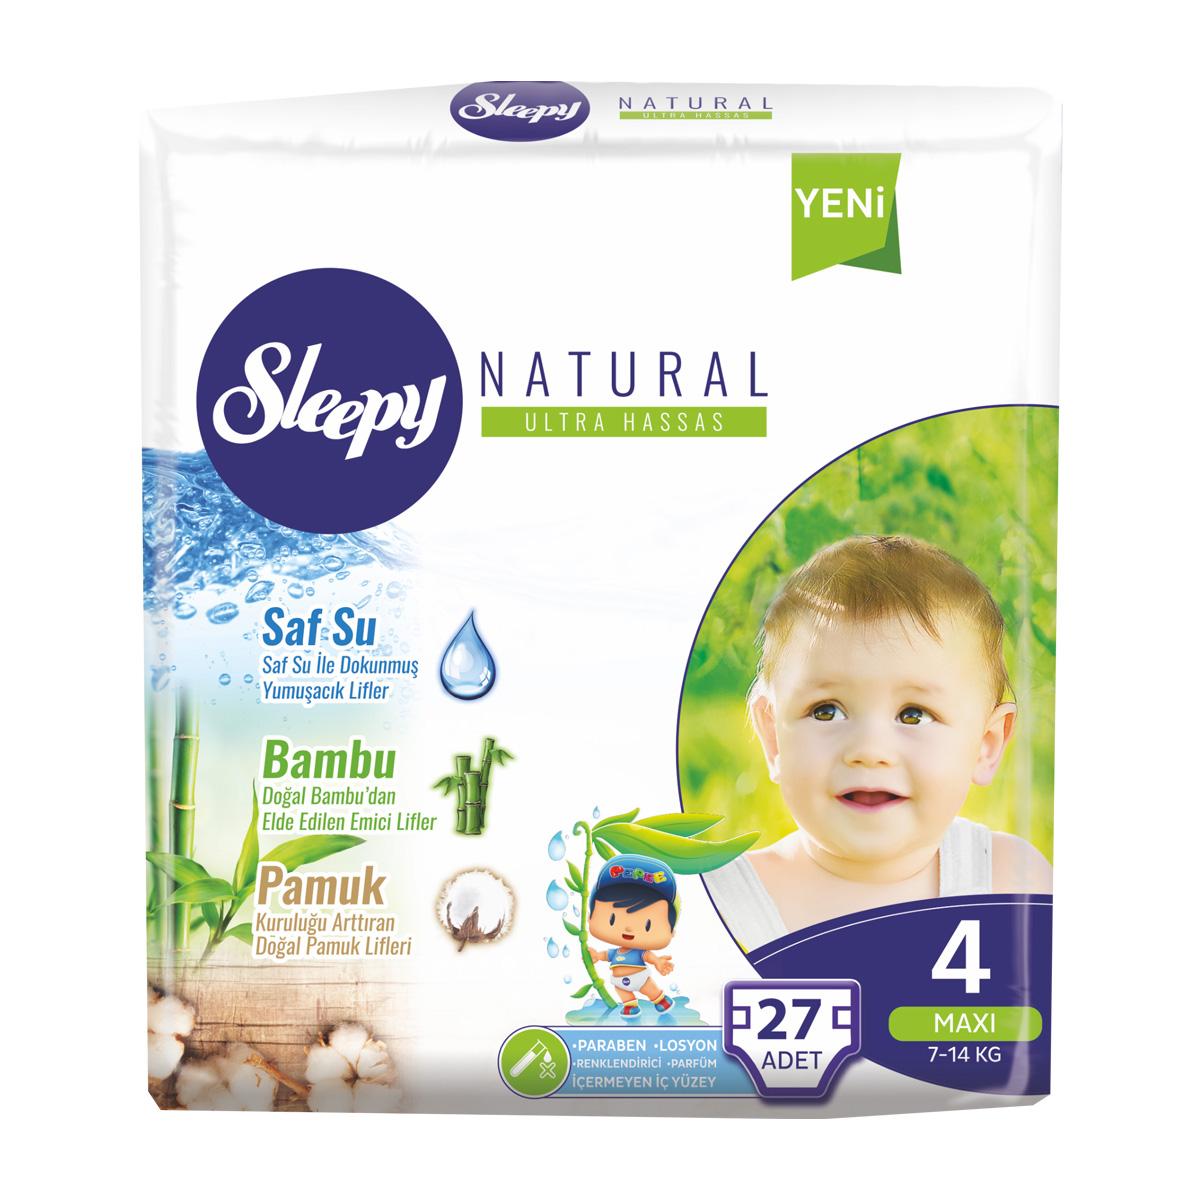 Sleepy Natural 4 Numara Maxi 27 Li Cocuk Bezi A101